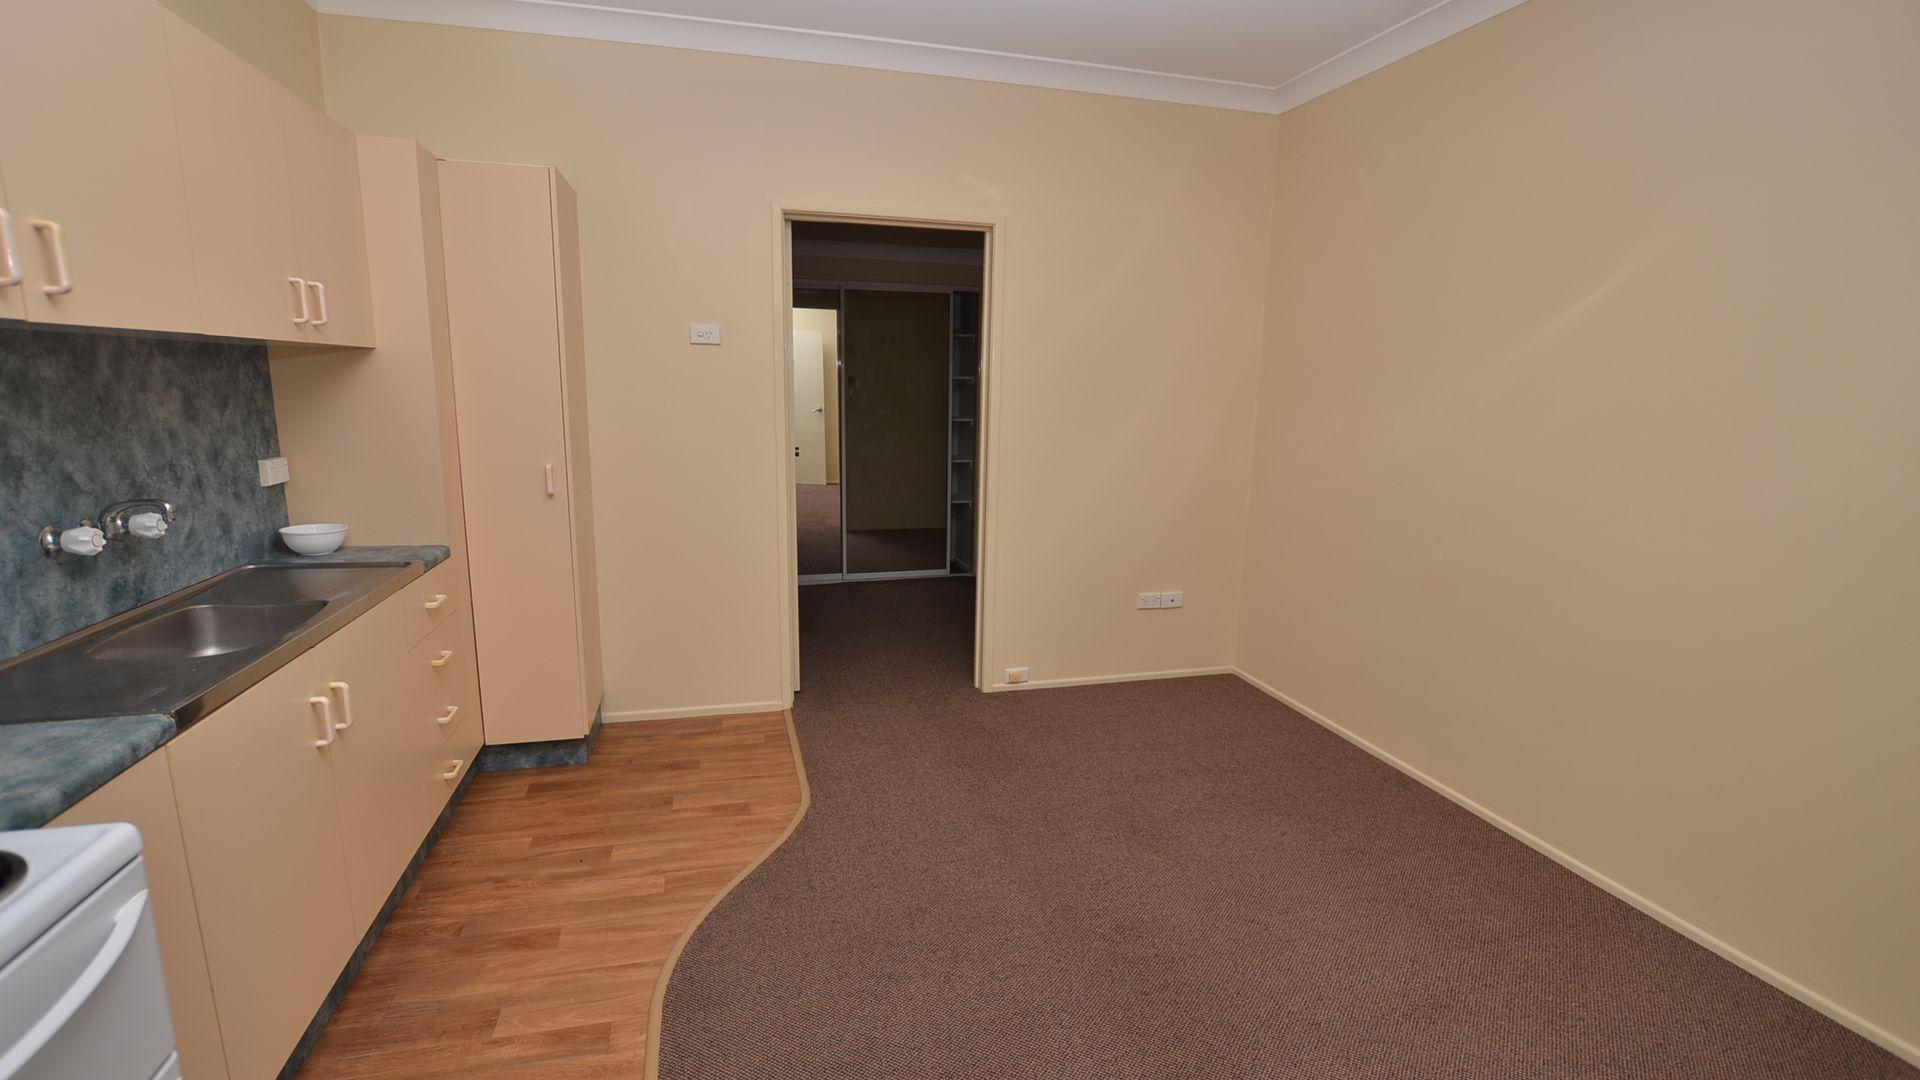 5/10 James Street, Yeppoon QLD 4703, Image 1